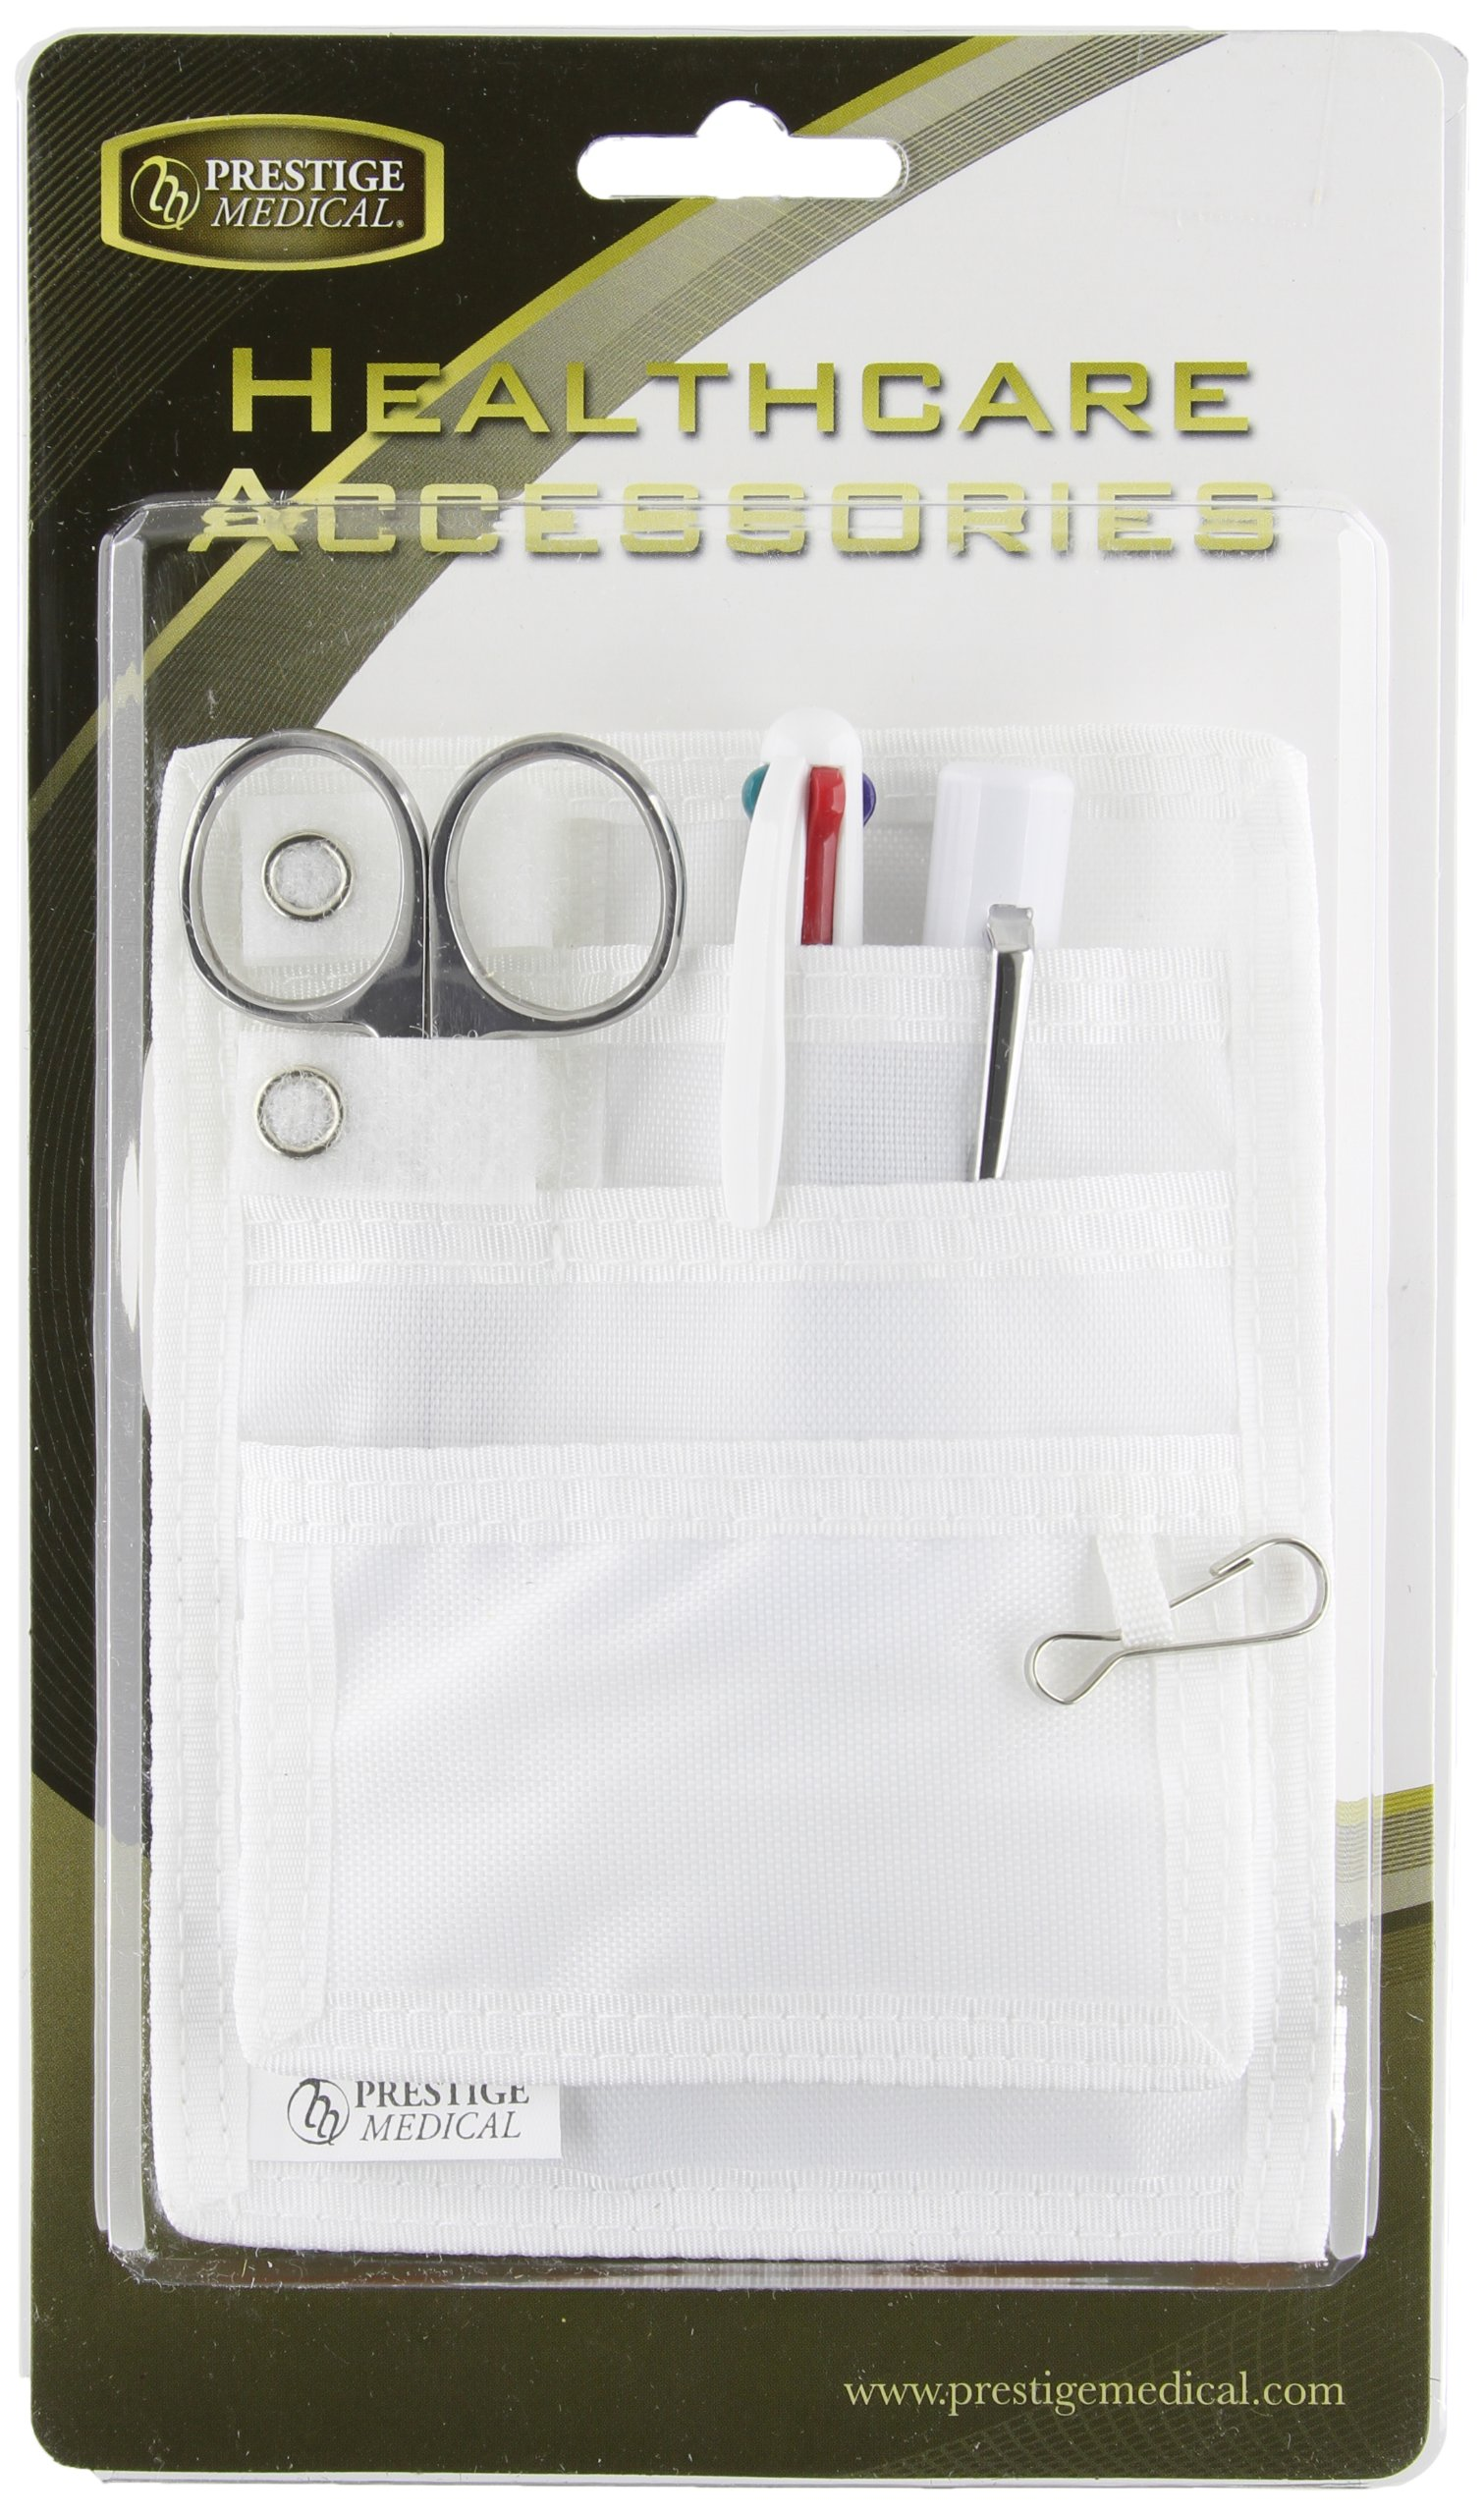 Prestige Medical Nurse Belt Loop Organizer Pal Kit - White